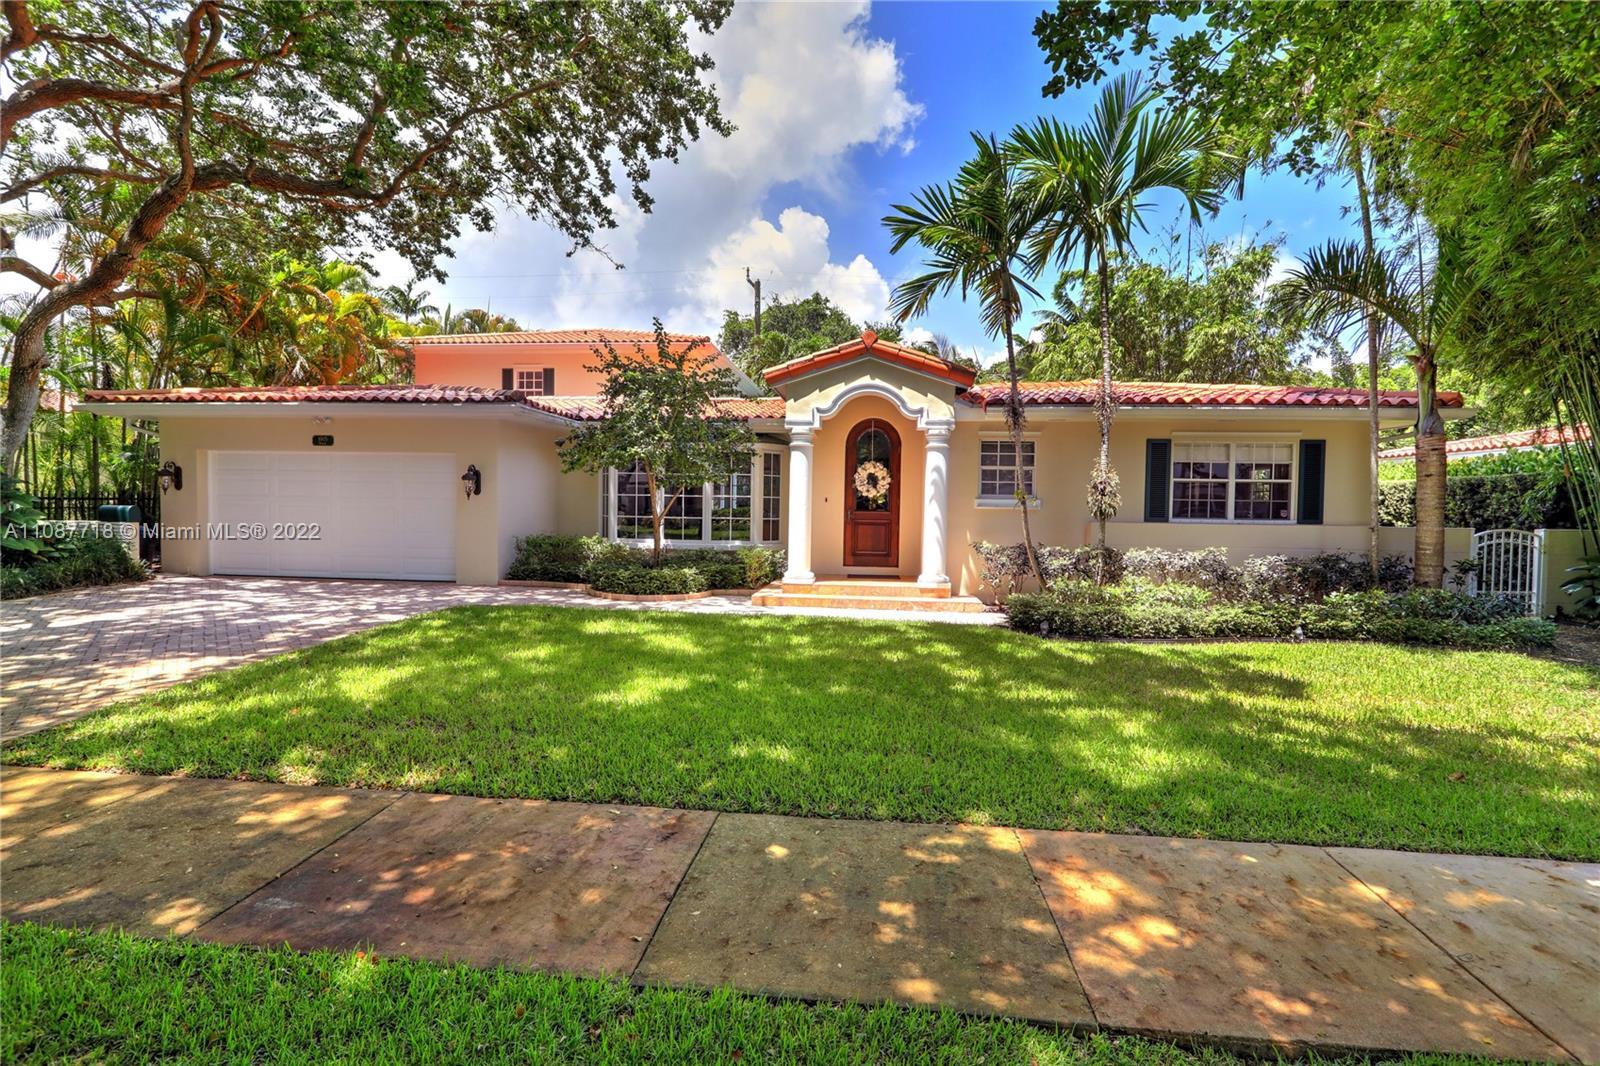 Riviera - 1015 Bayamo Ave, Coral Gables, FL 33146